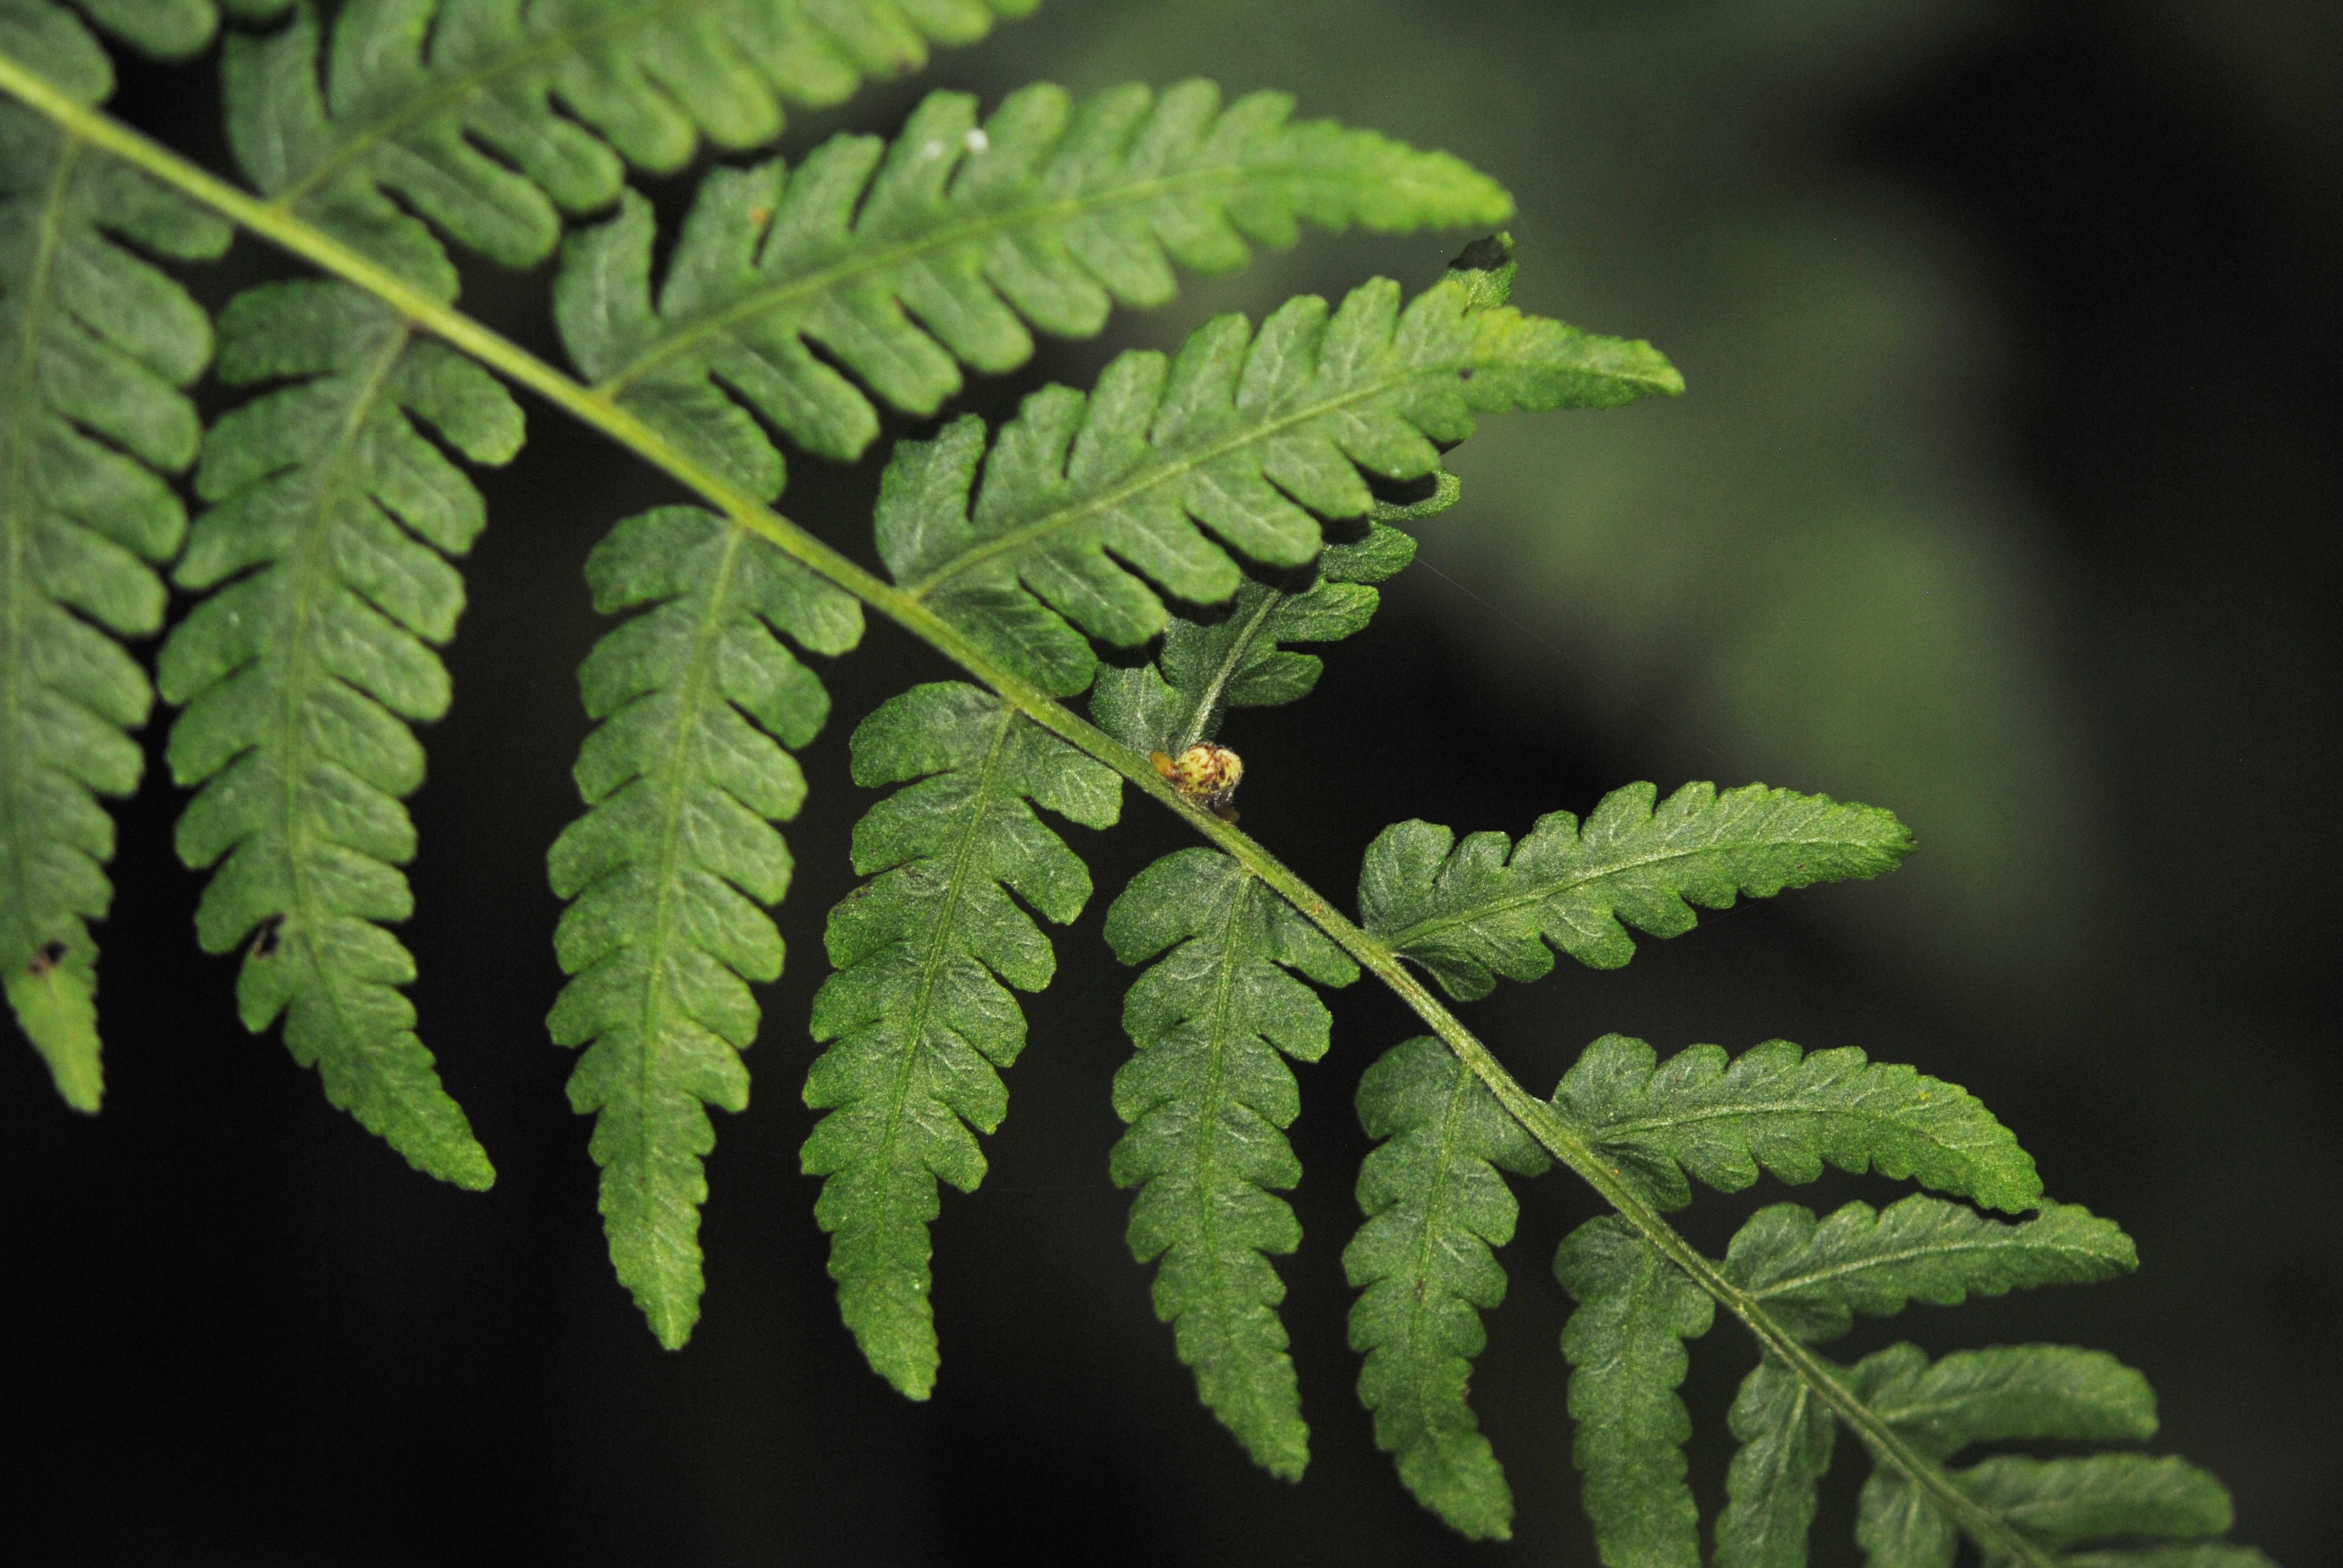 Amauropelta scalaris